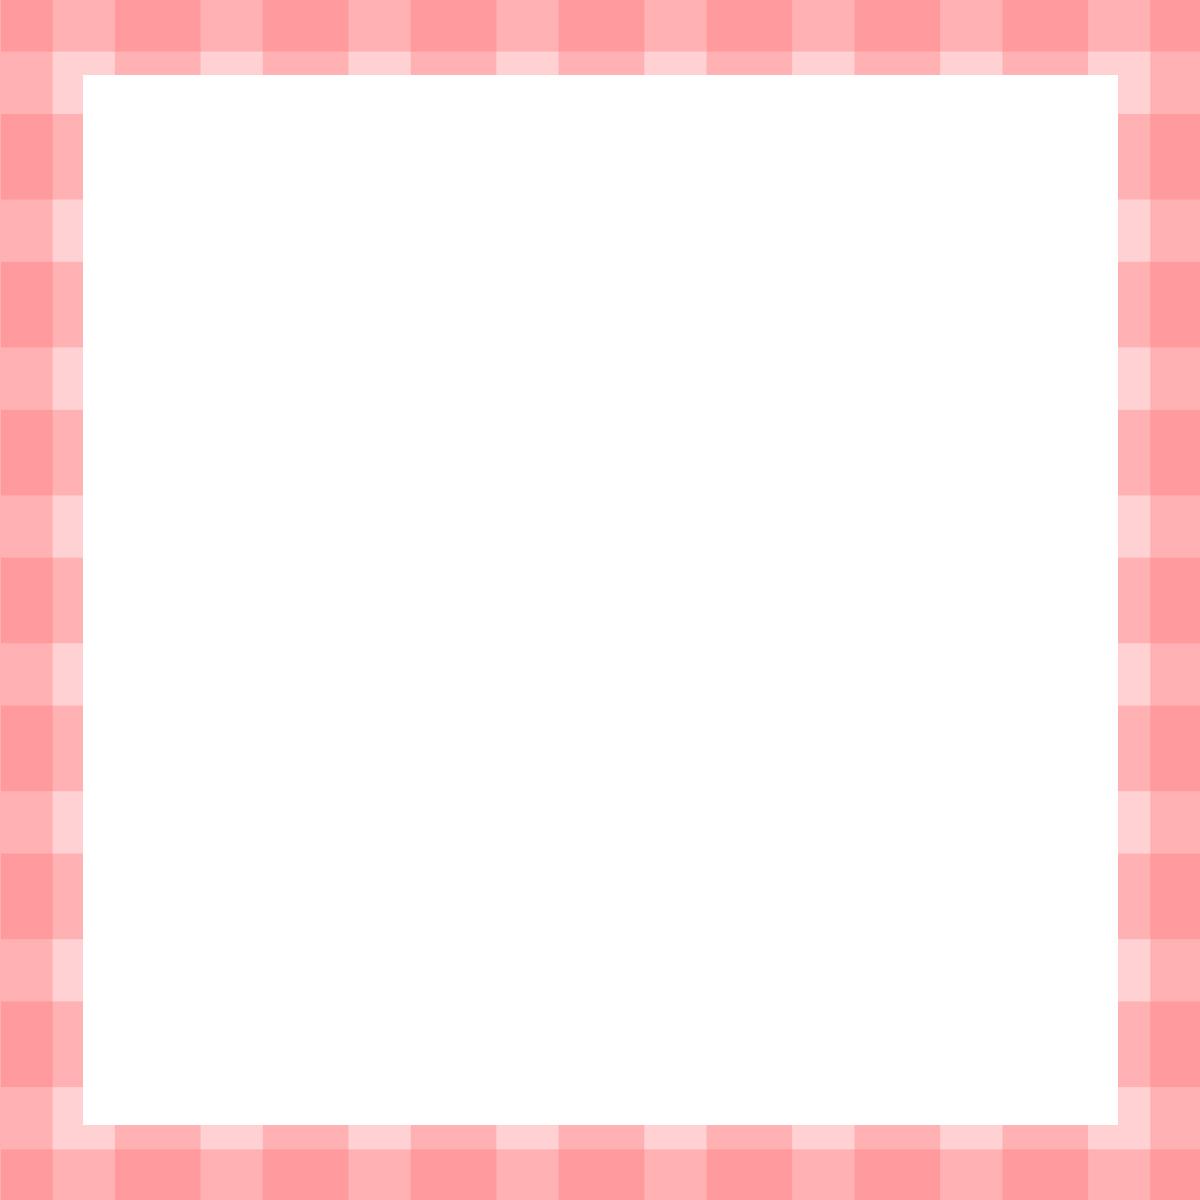 【Instagram用】のピンクチェックの背景フレームのイラスト